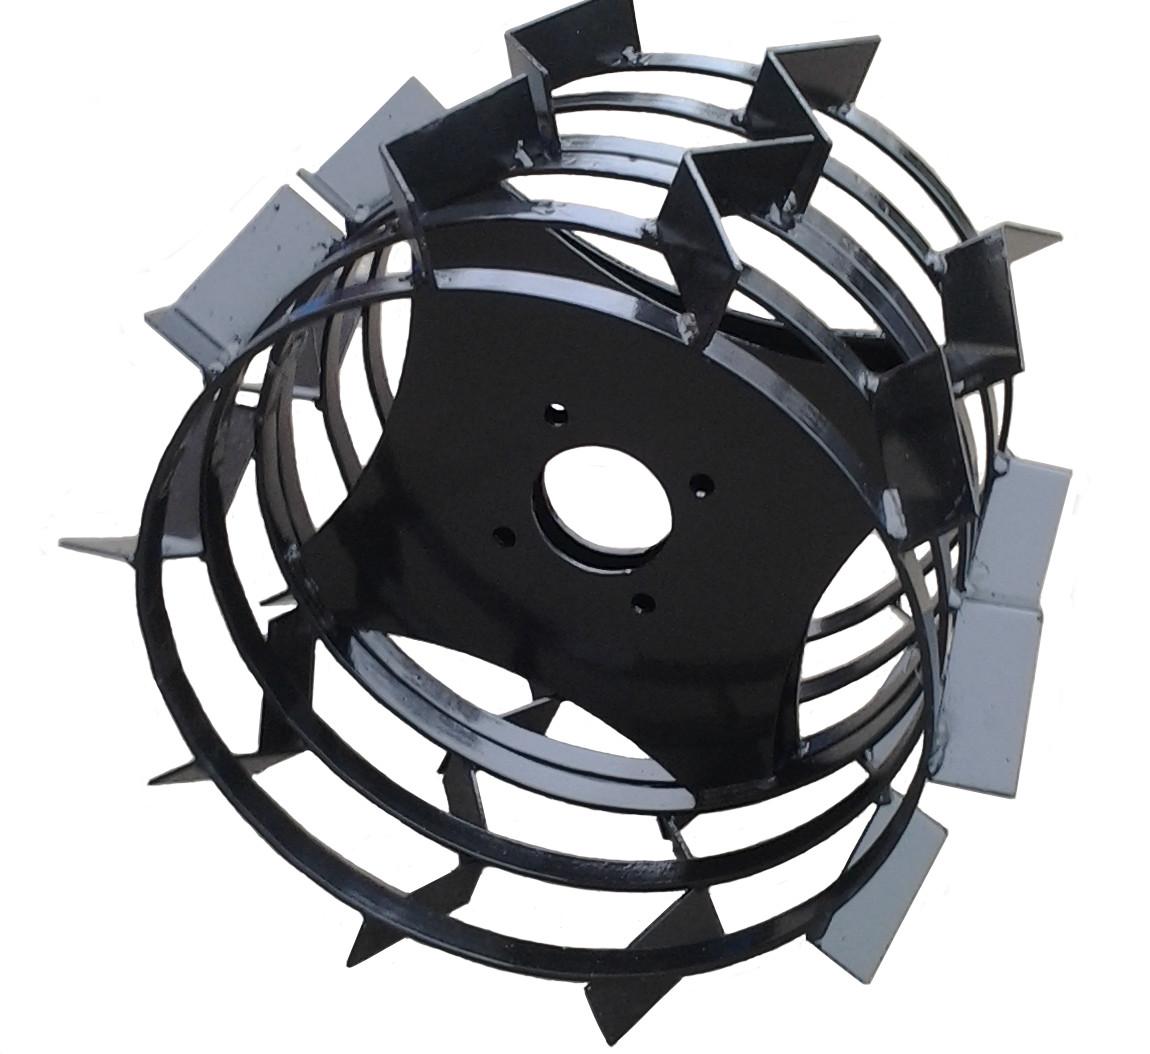 Грунтозачепи для мотоблока 420*150мм Агромоторсервис КС-480